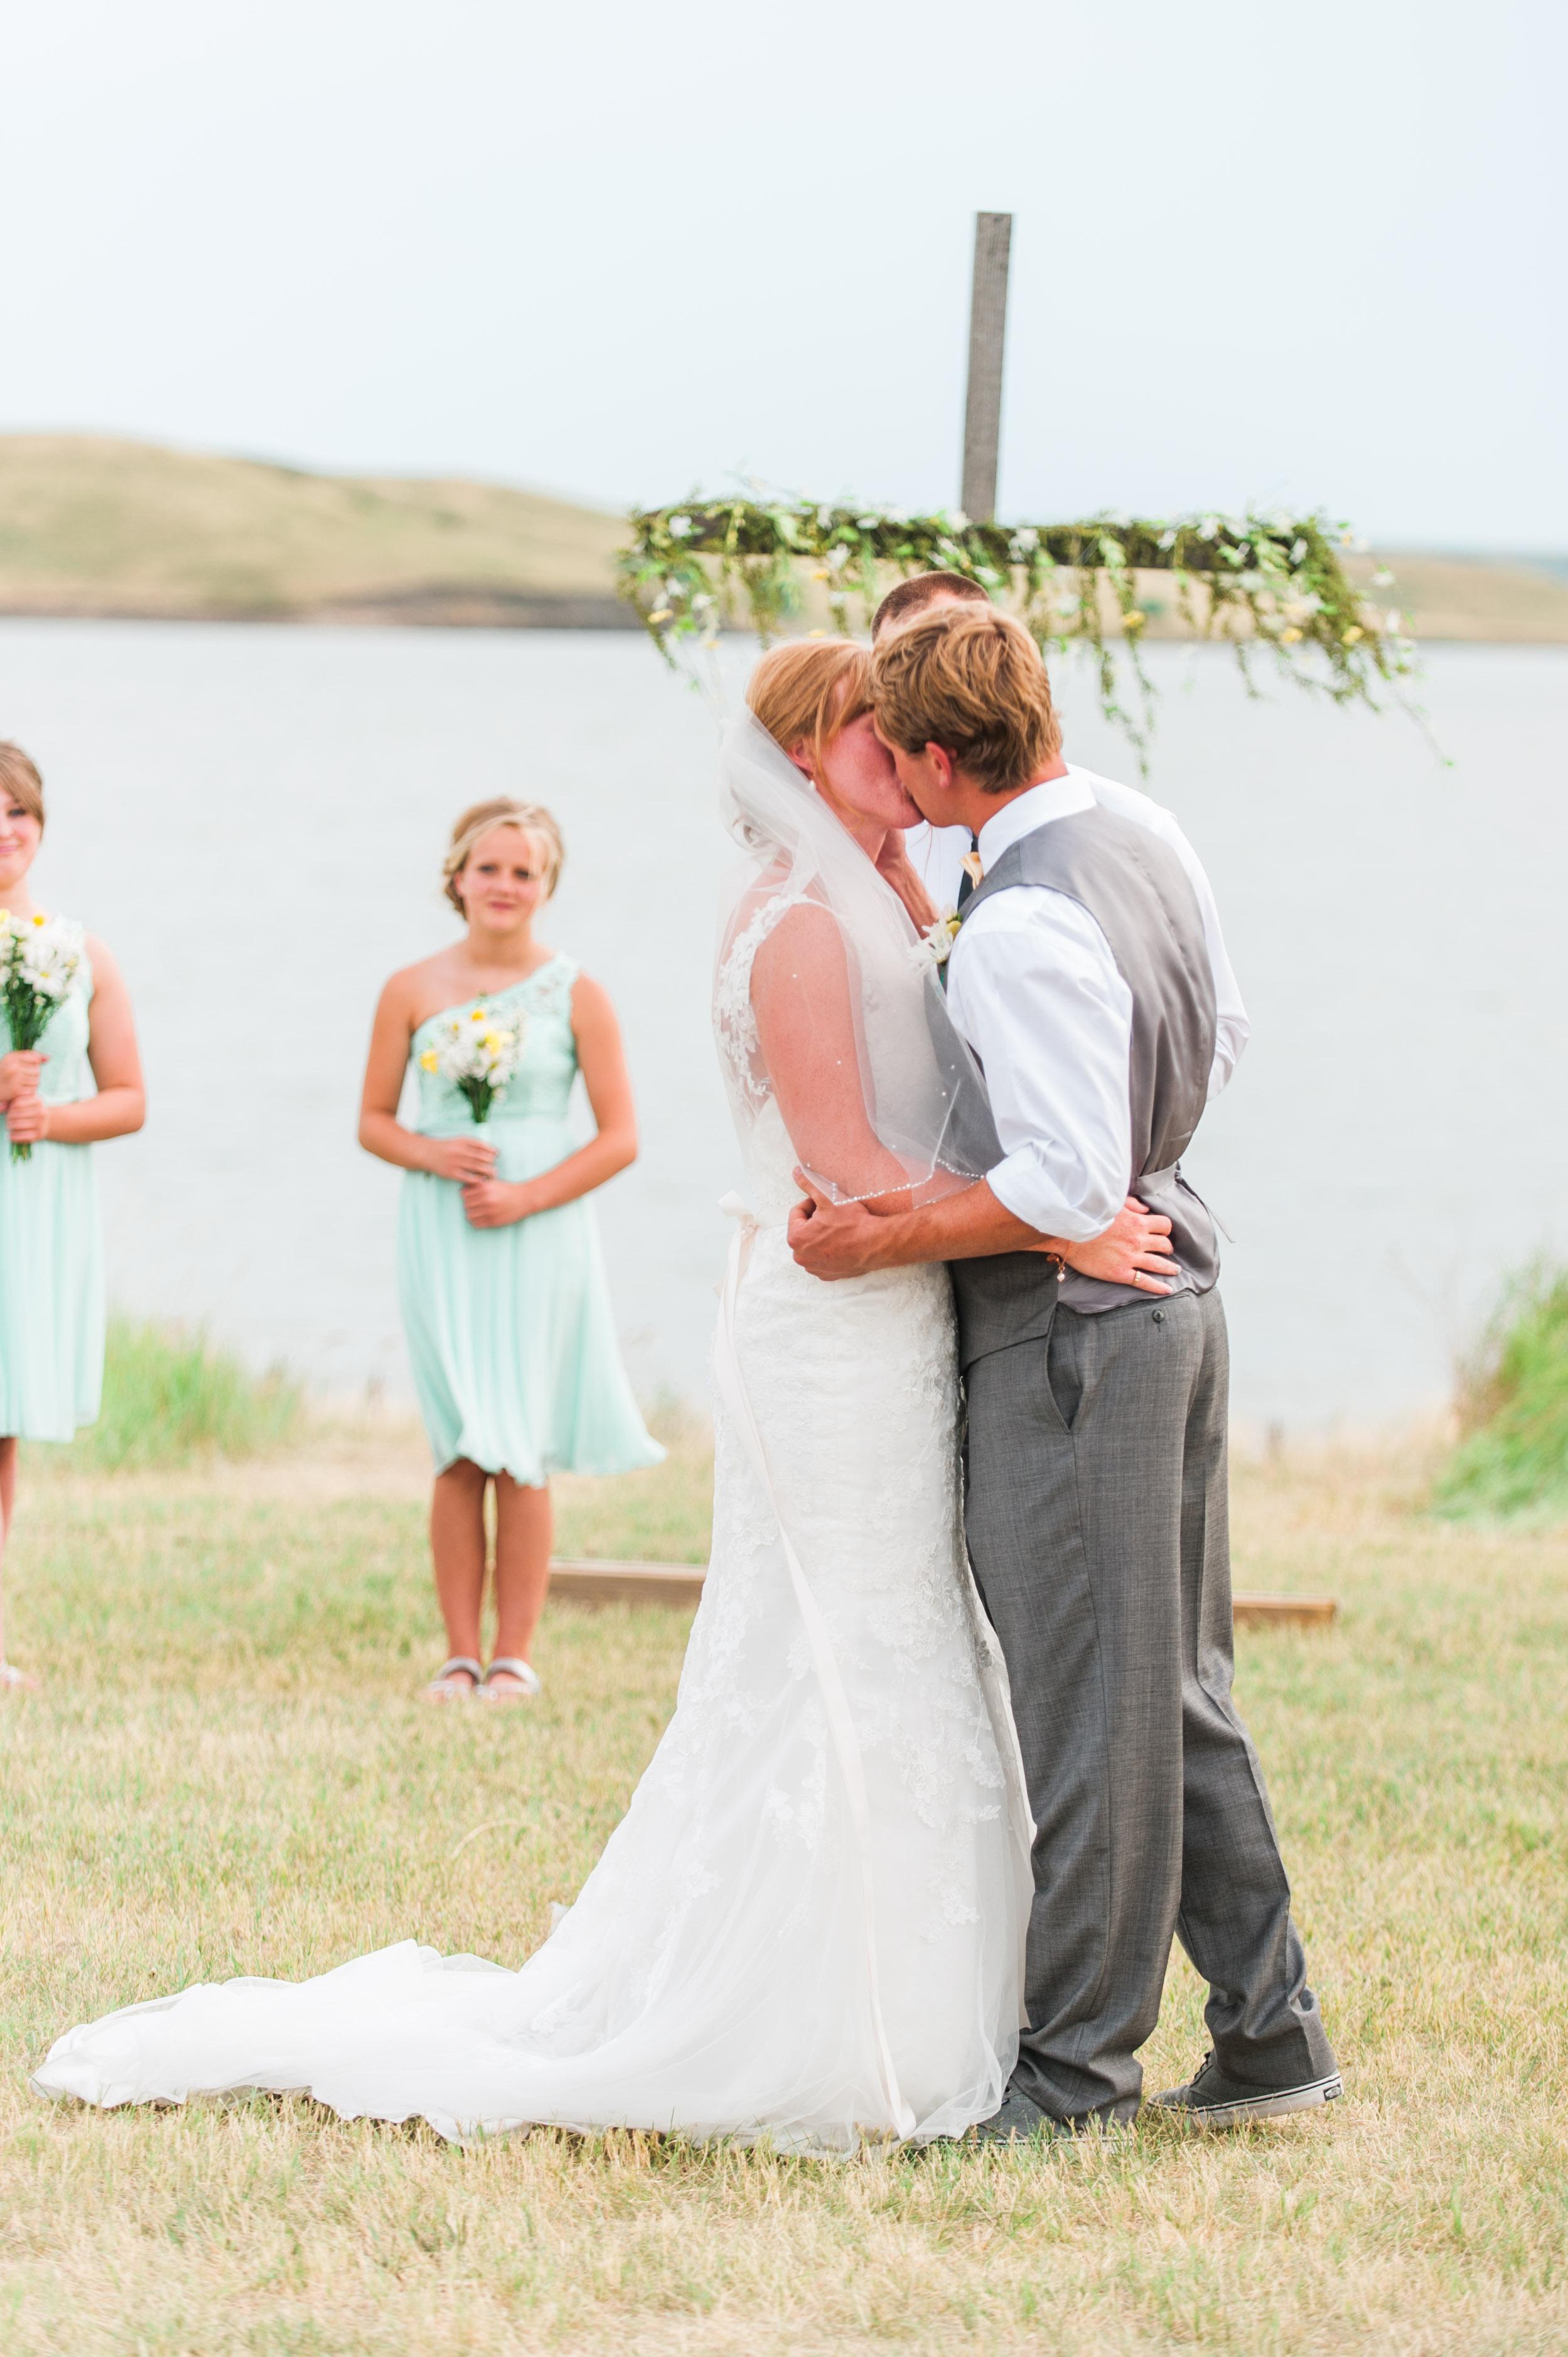 wedding-photography-26.jpg